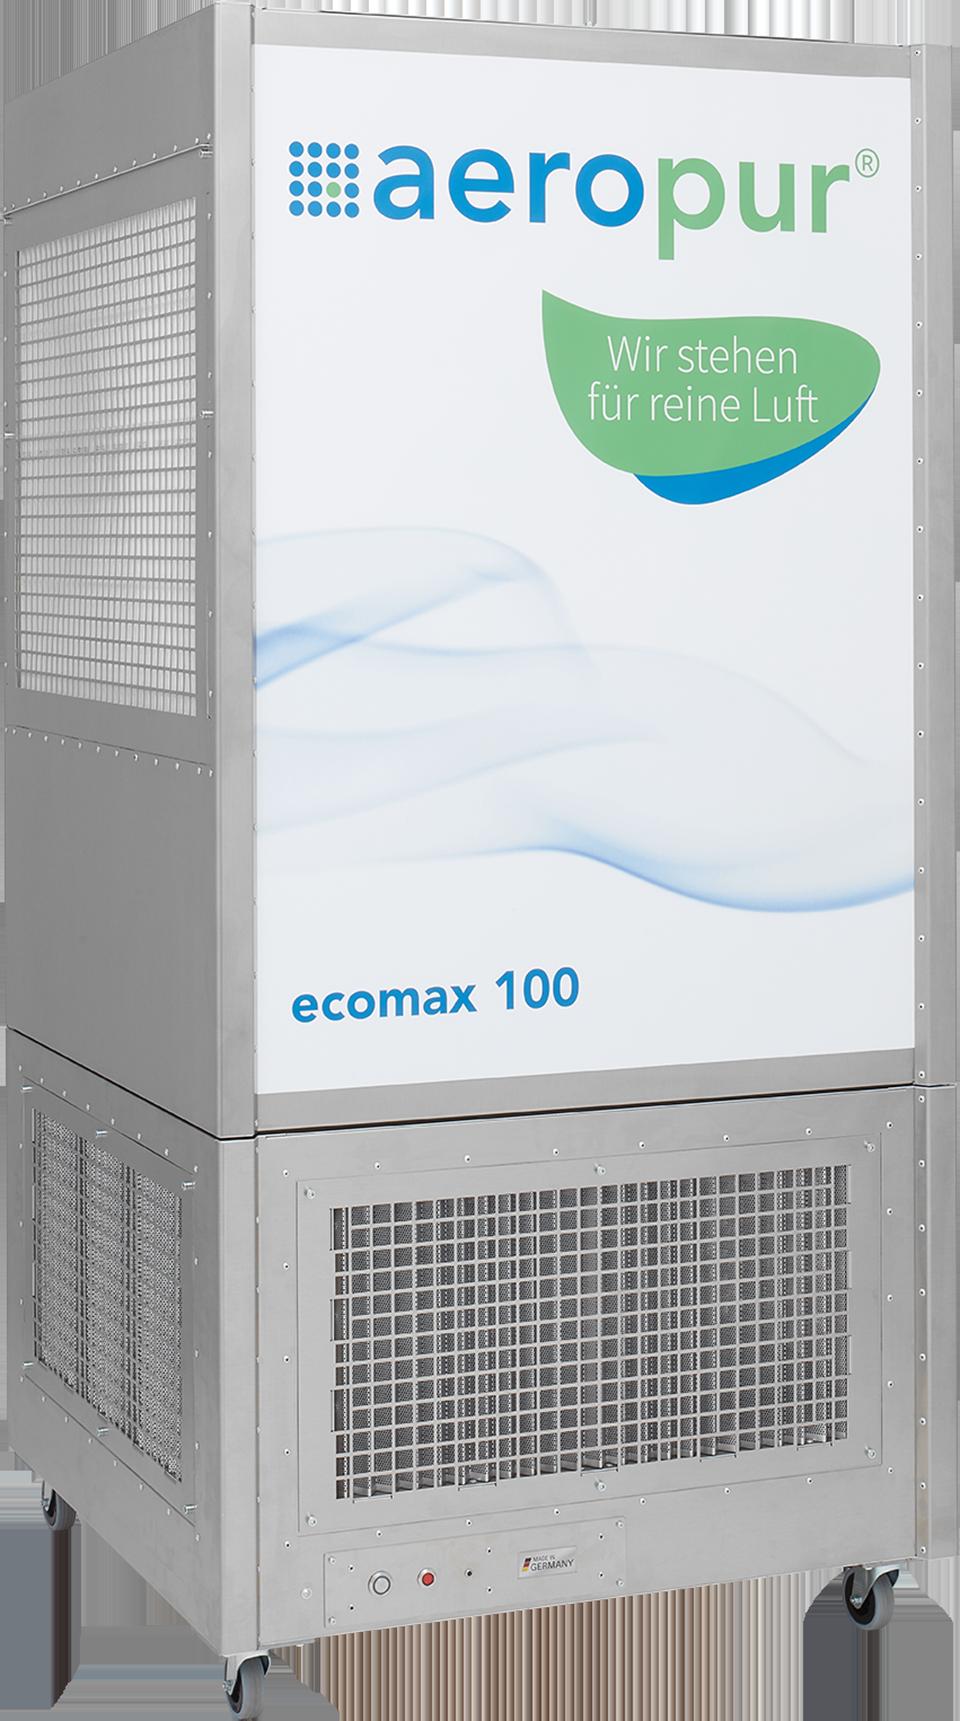 ecomax100